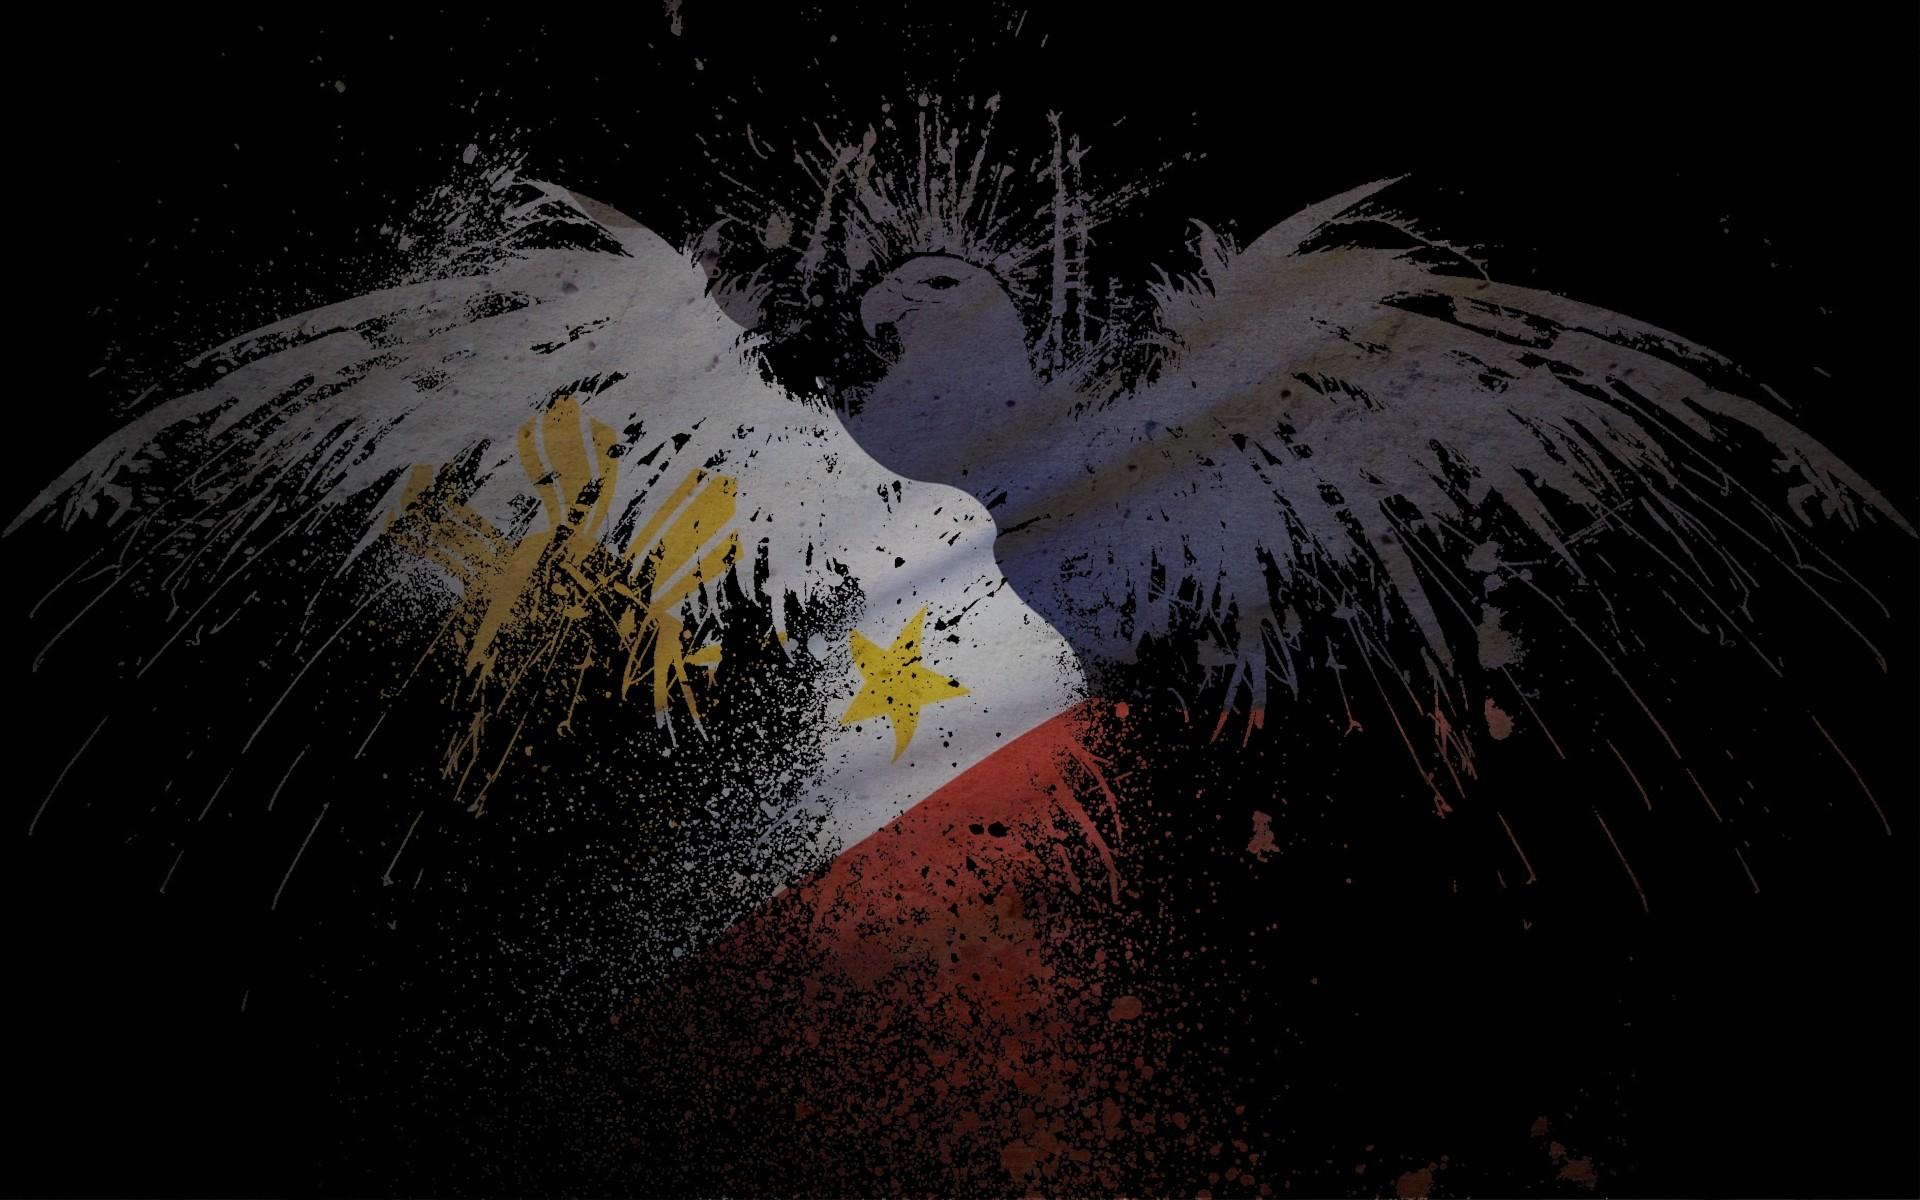 Desktop eagle flag wallpaper 3d hd pictures.